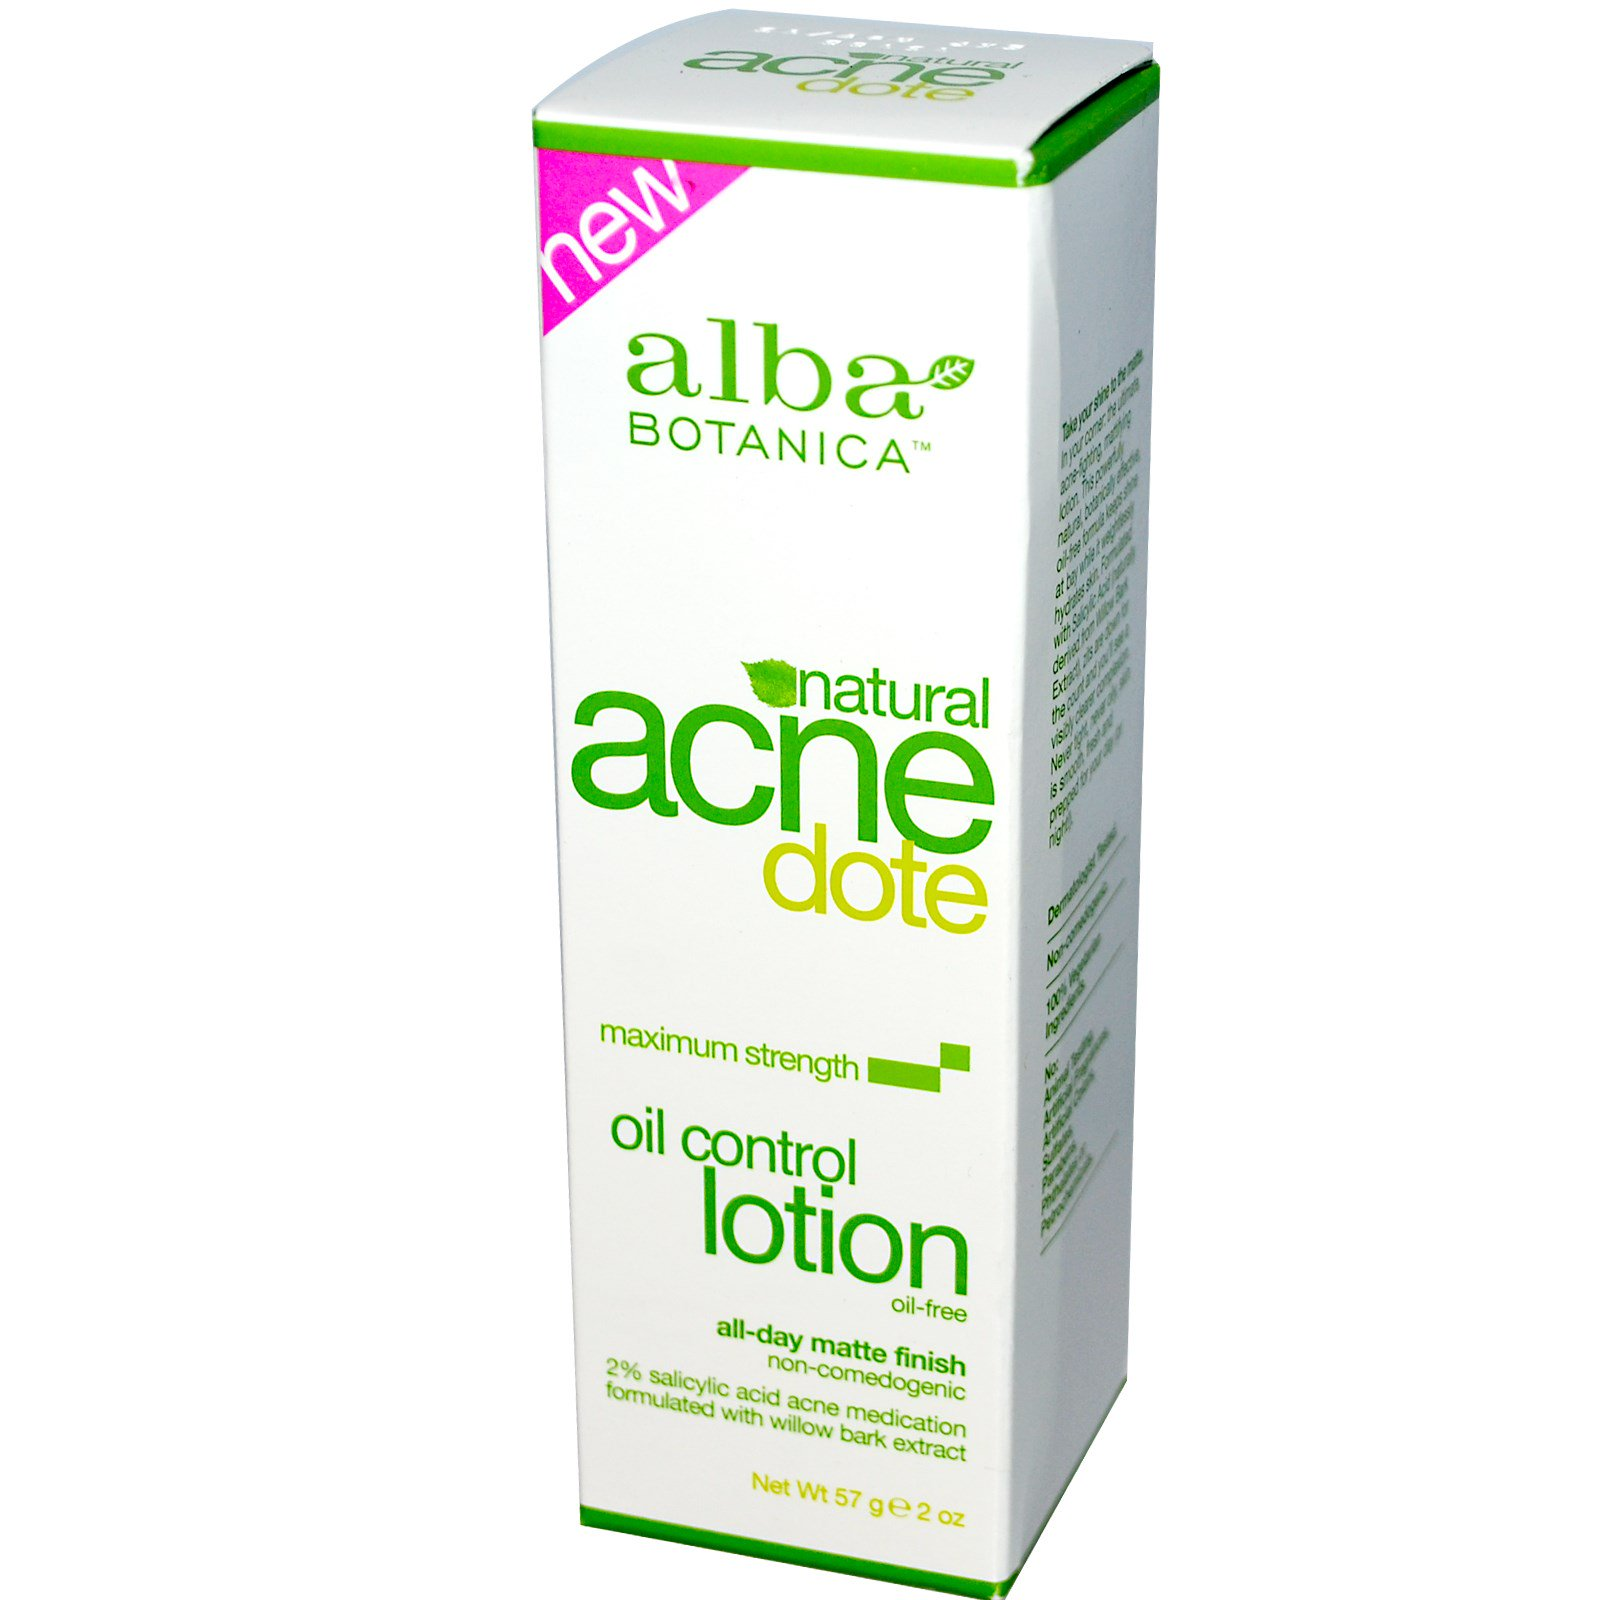 Alba Botanica, Acne Dote, Oil Control Lotion, Oil-Free, 2 oz (57 g)